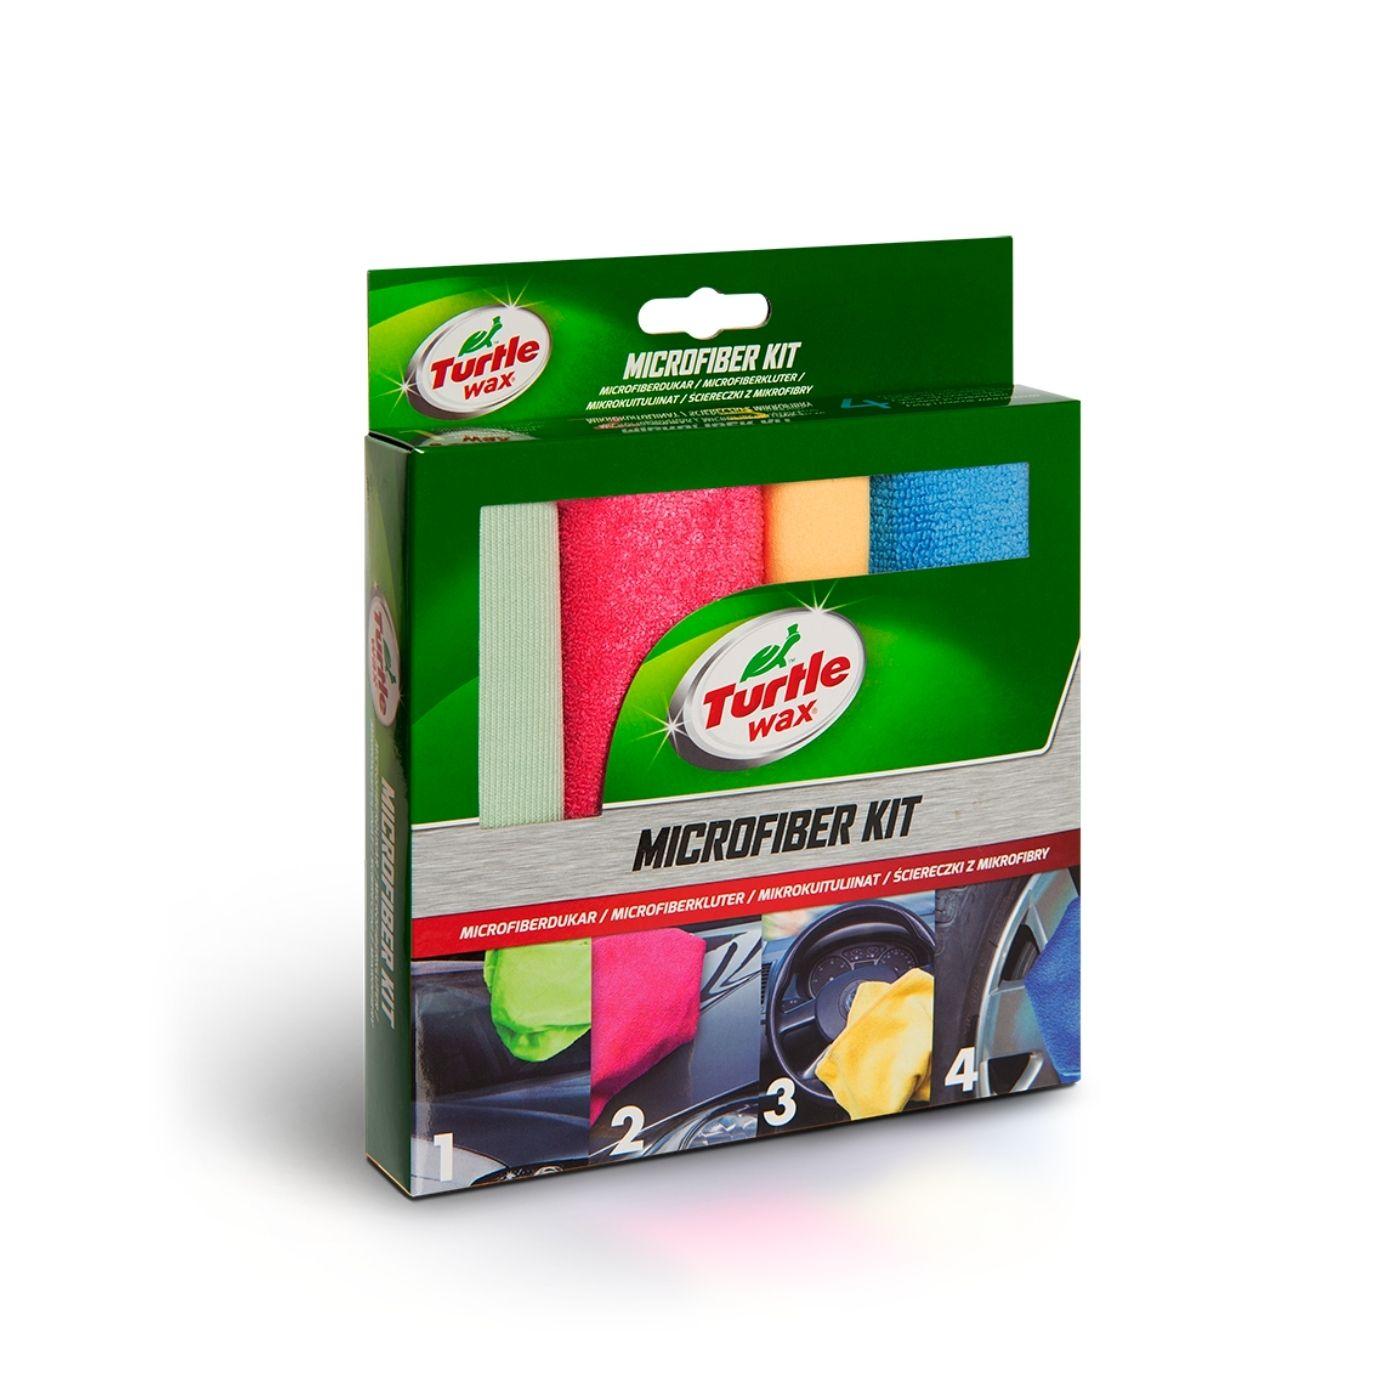 Mikrofiberdukar Turtle Wax Microfiber Kit, 4 st